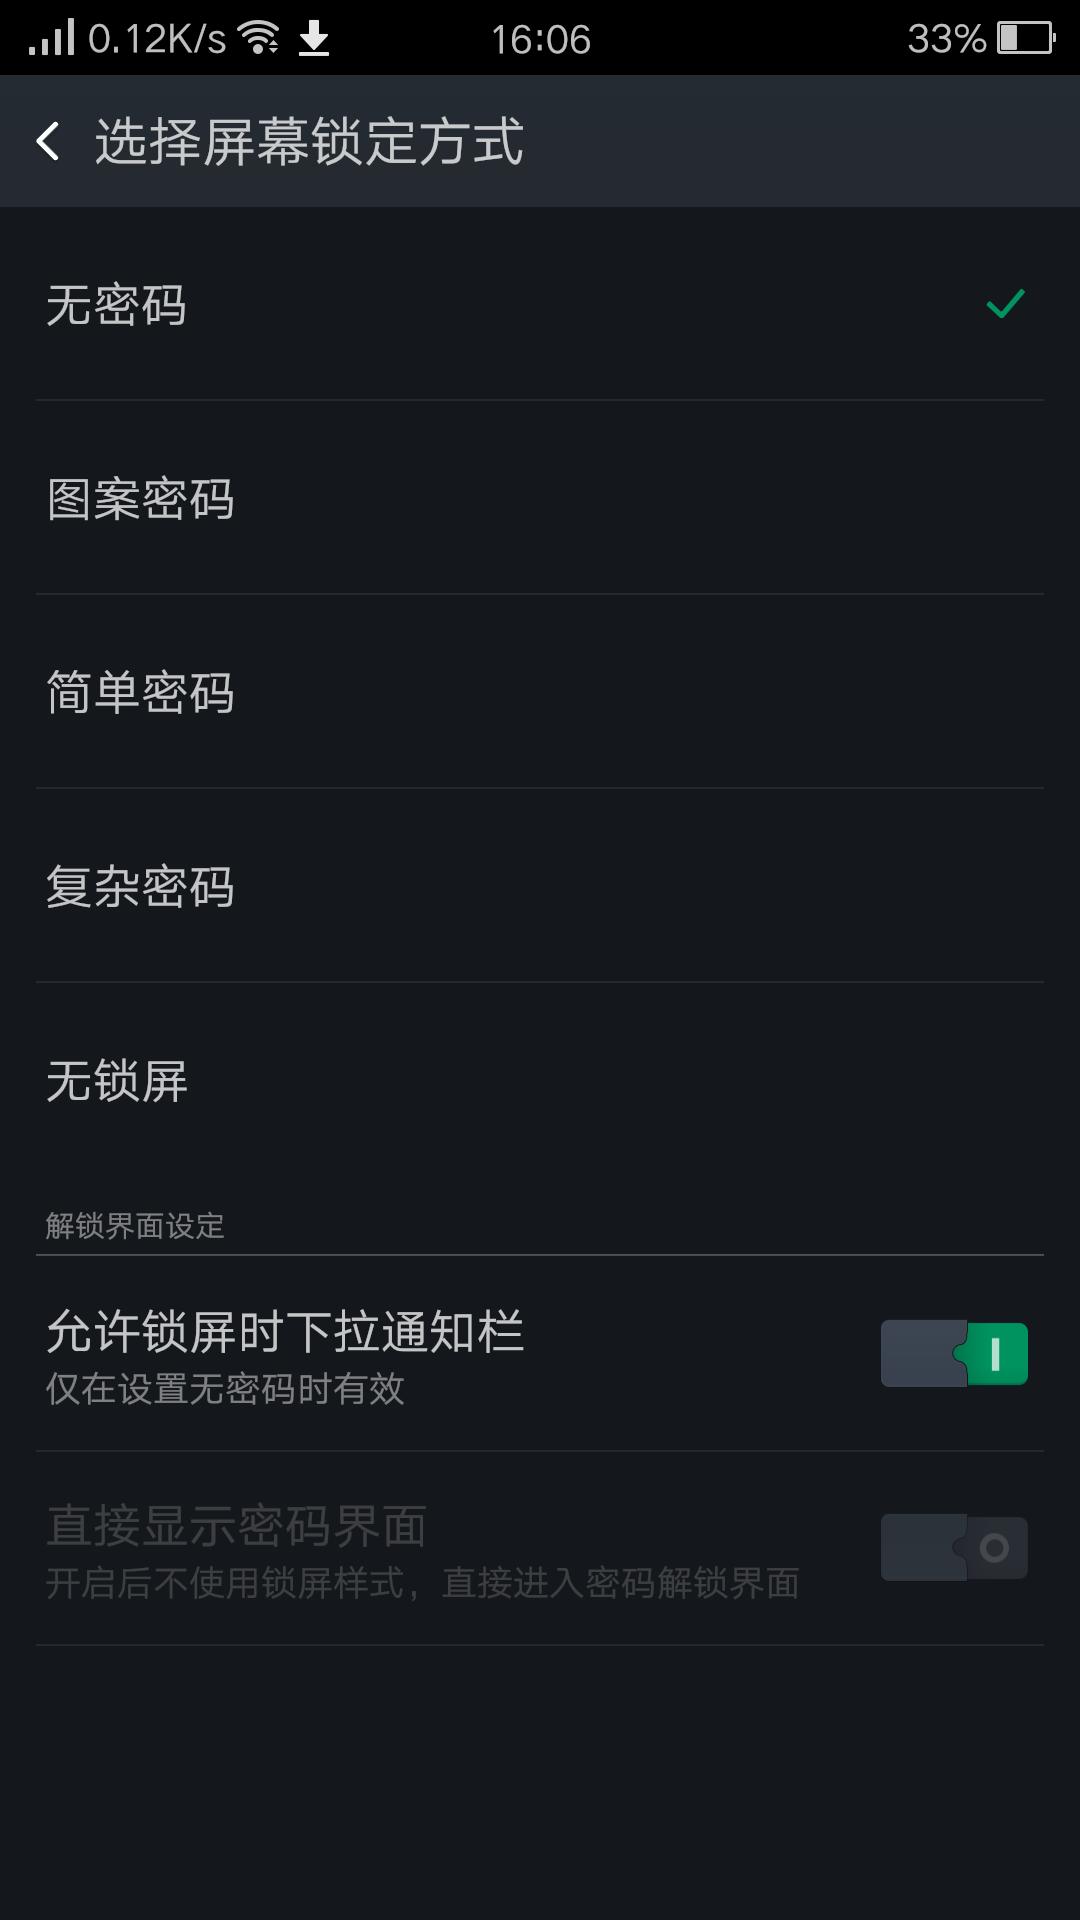 oppo手机锁屏壁纸可以换成数字密码锁屏吗图片